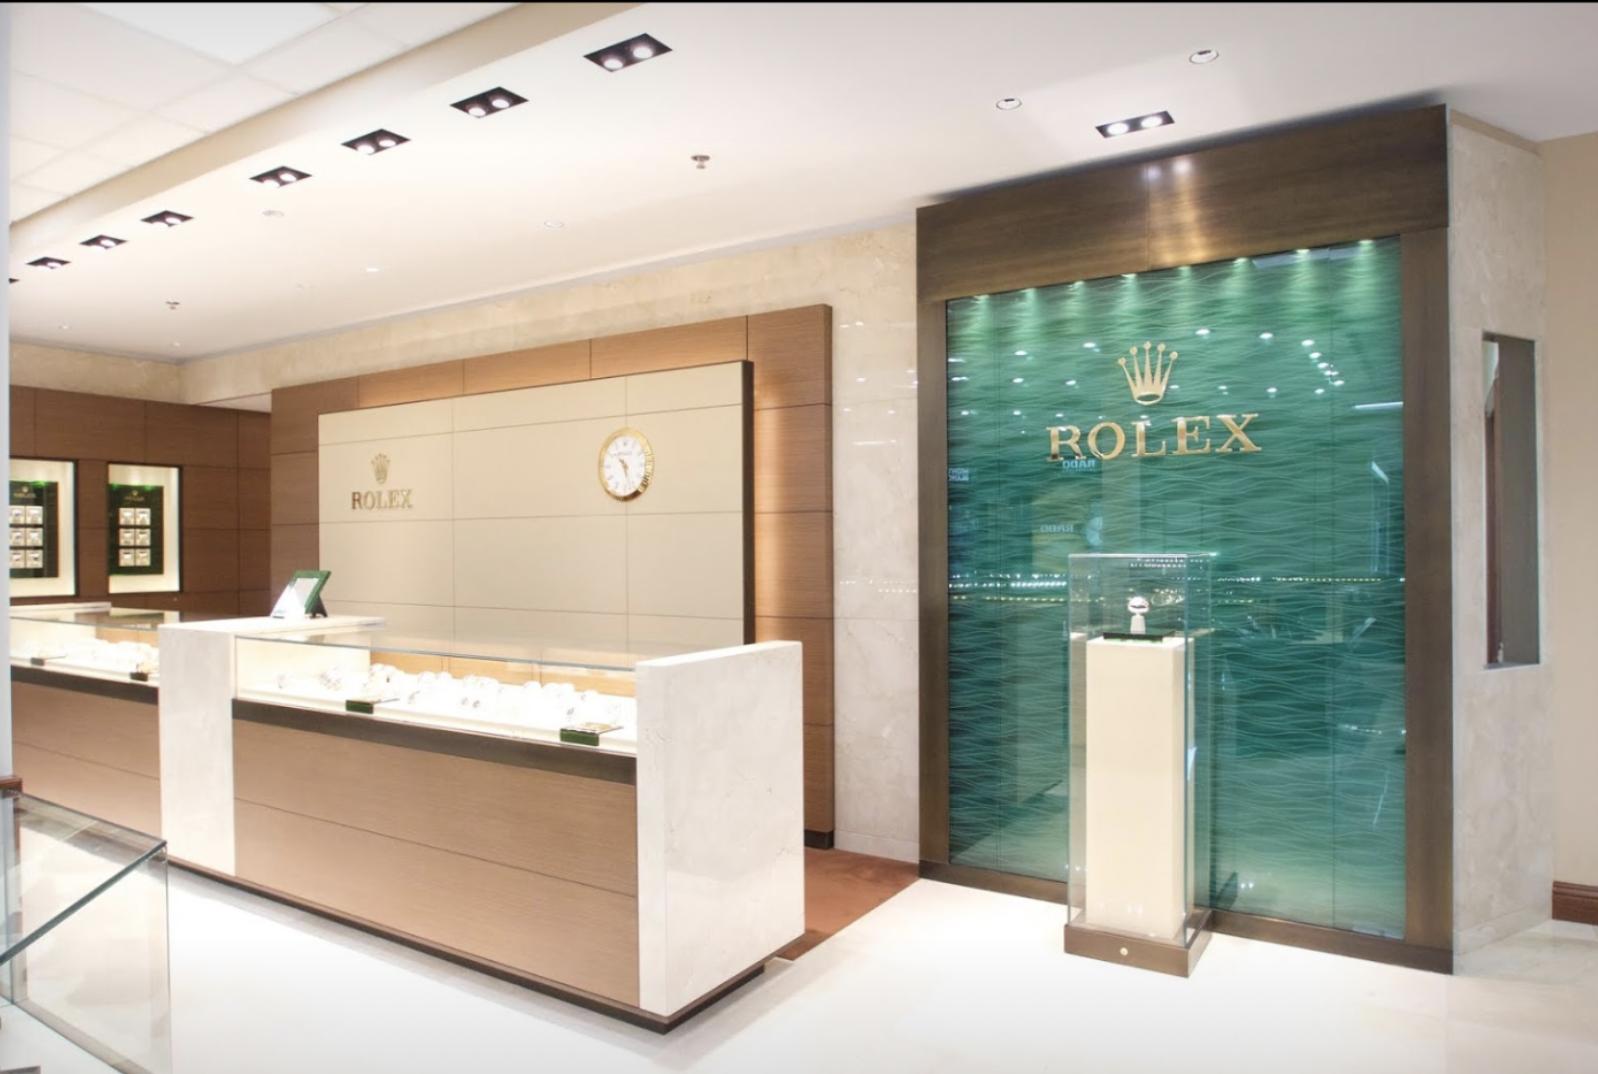 Cleveland Rolex Dealer - Sheiban Jewelers